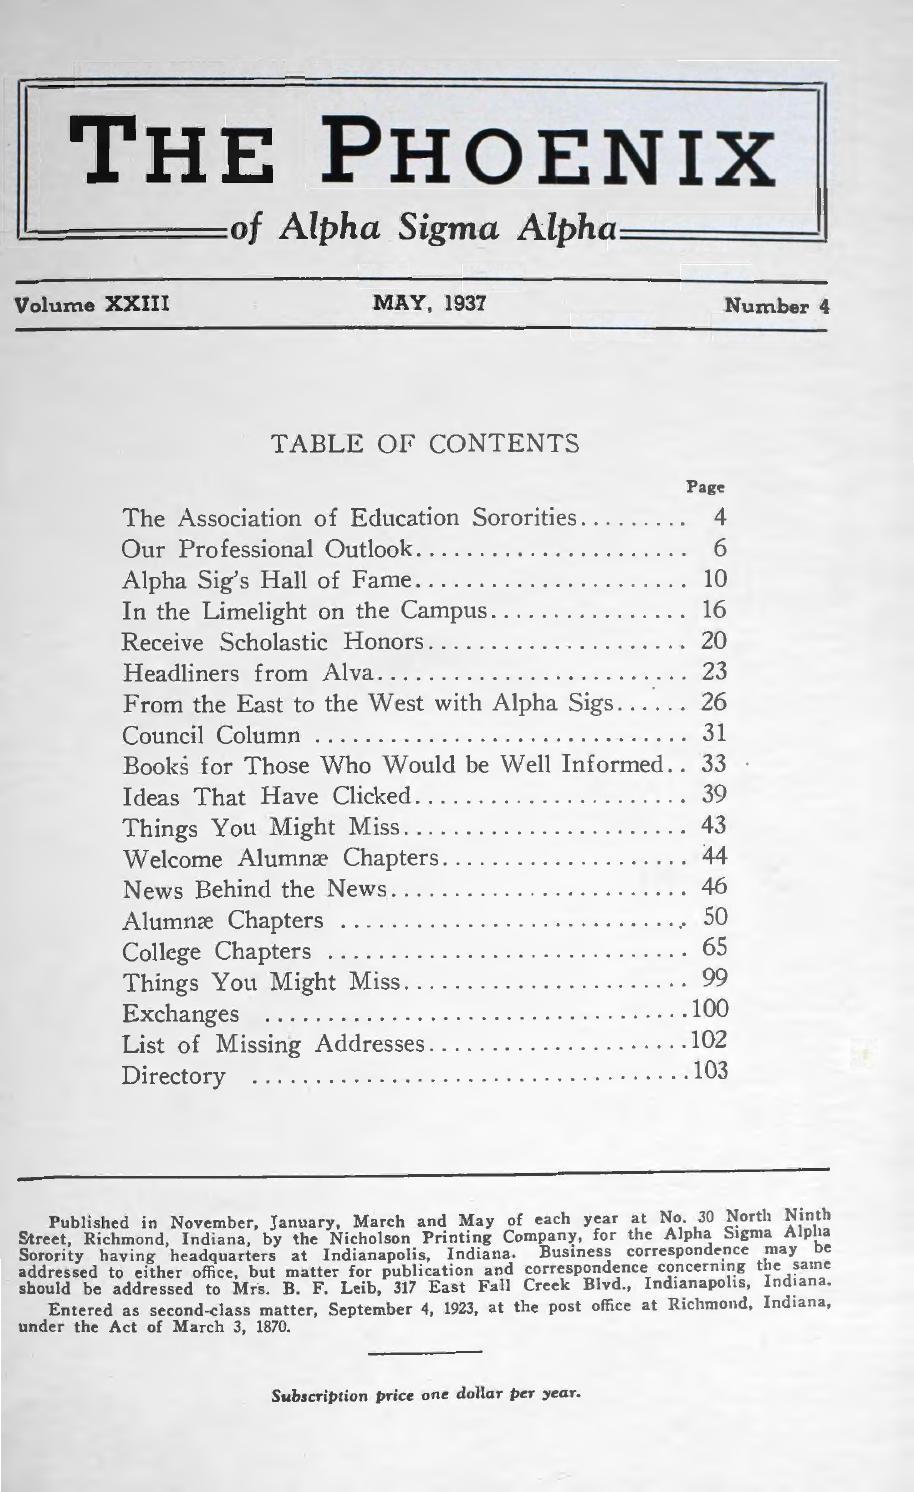 Asa phoenix vol 23 no 4 may 1937 by Alpha Sigma Alpha Sorority - issuu